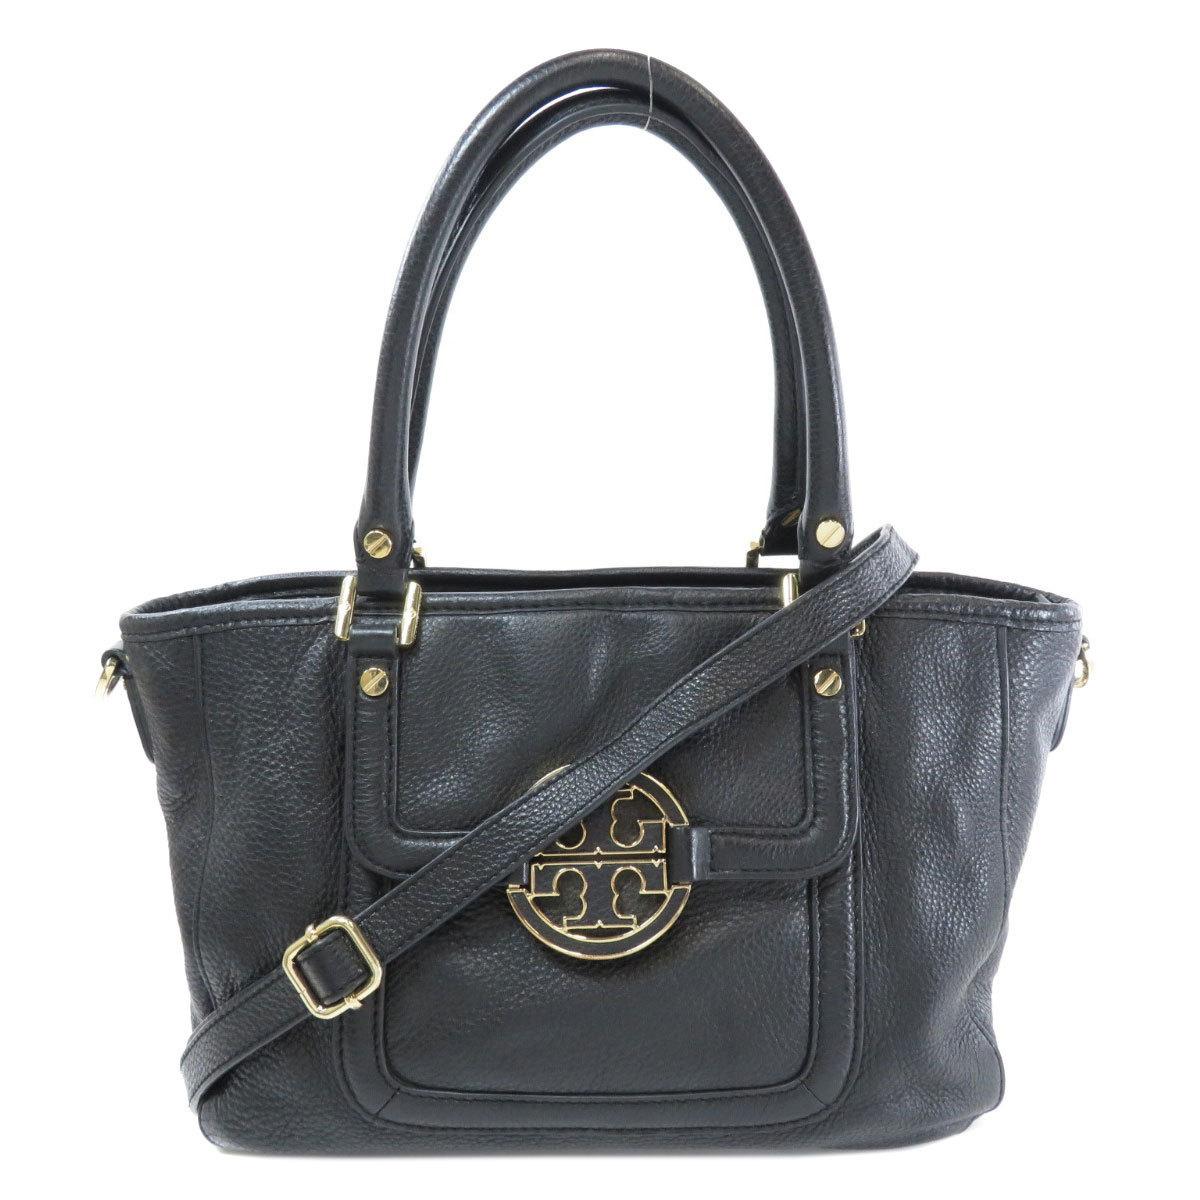 Tory Burch logo motif handbag leather ladies